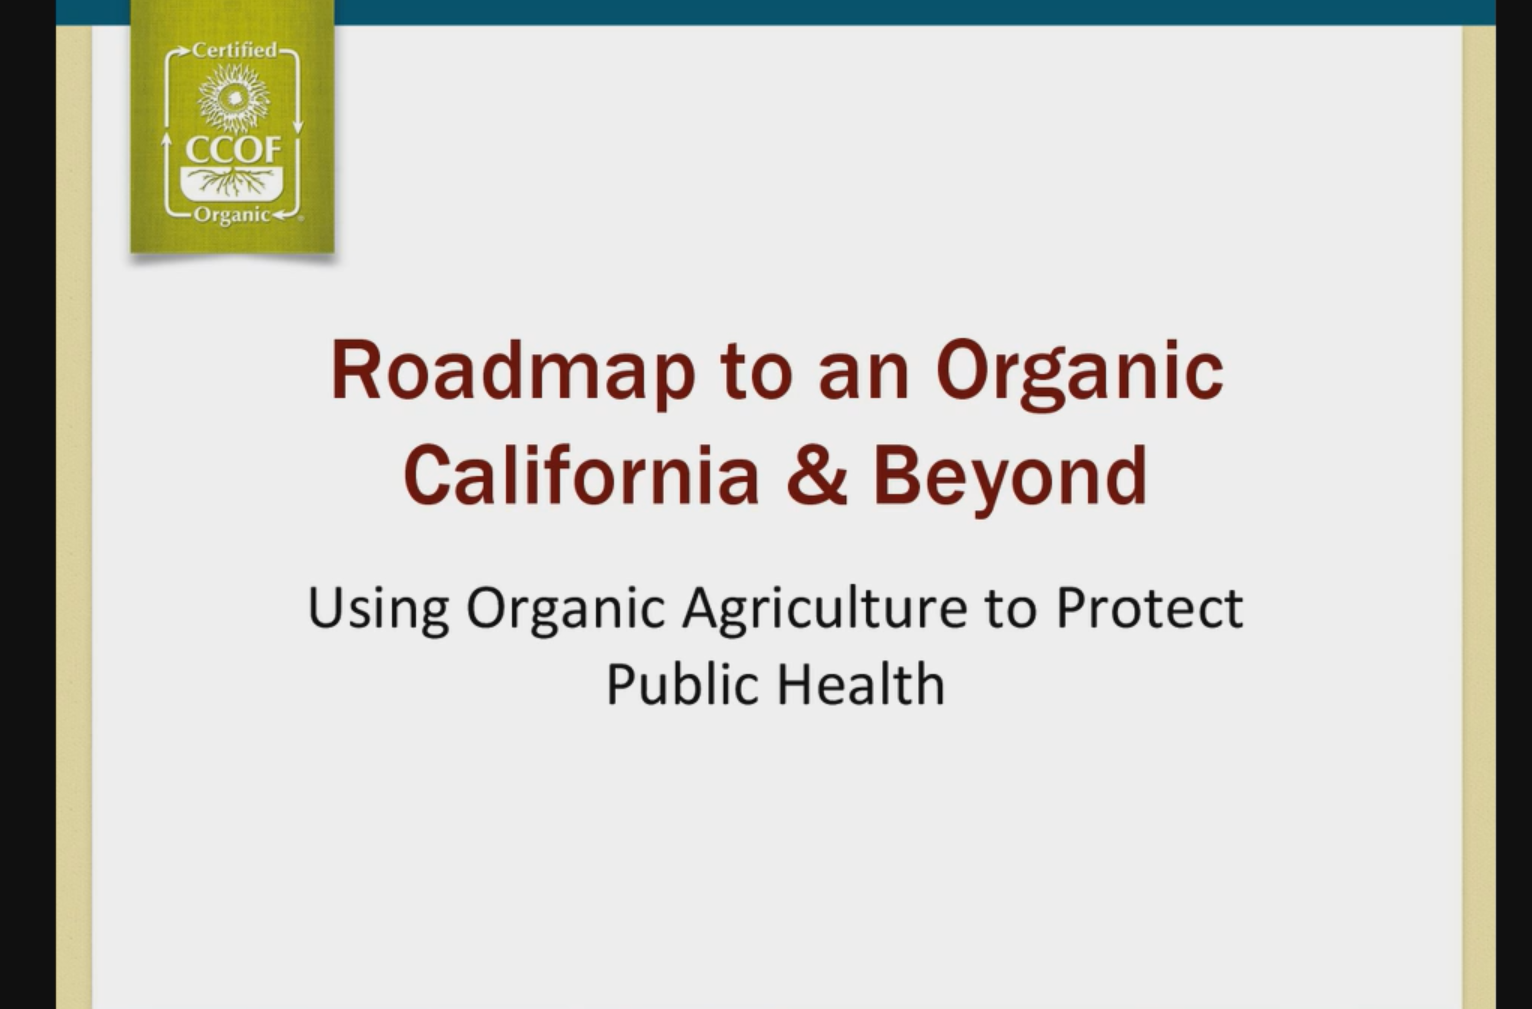 Green Tea Webinar Series: Roadmap to an Organic California & Beyond